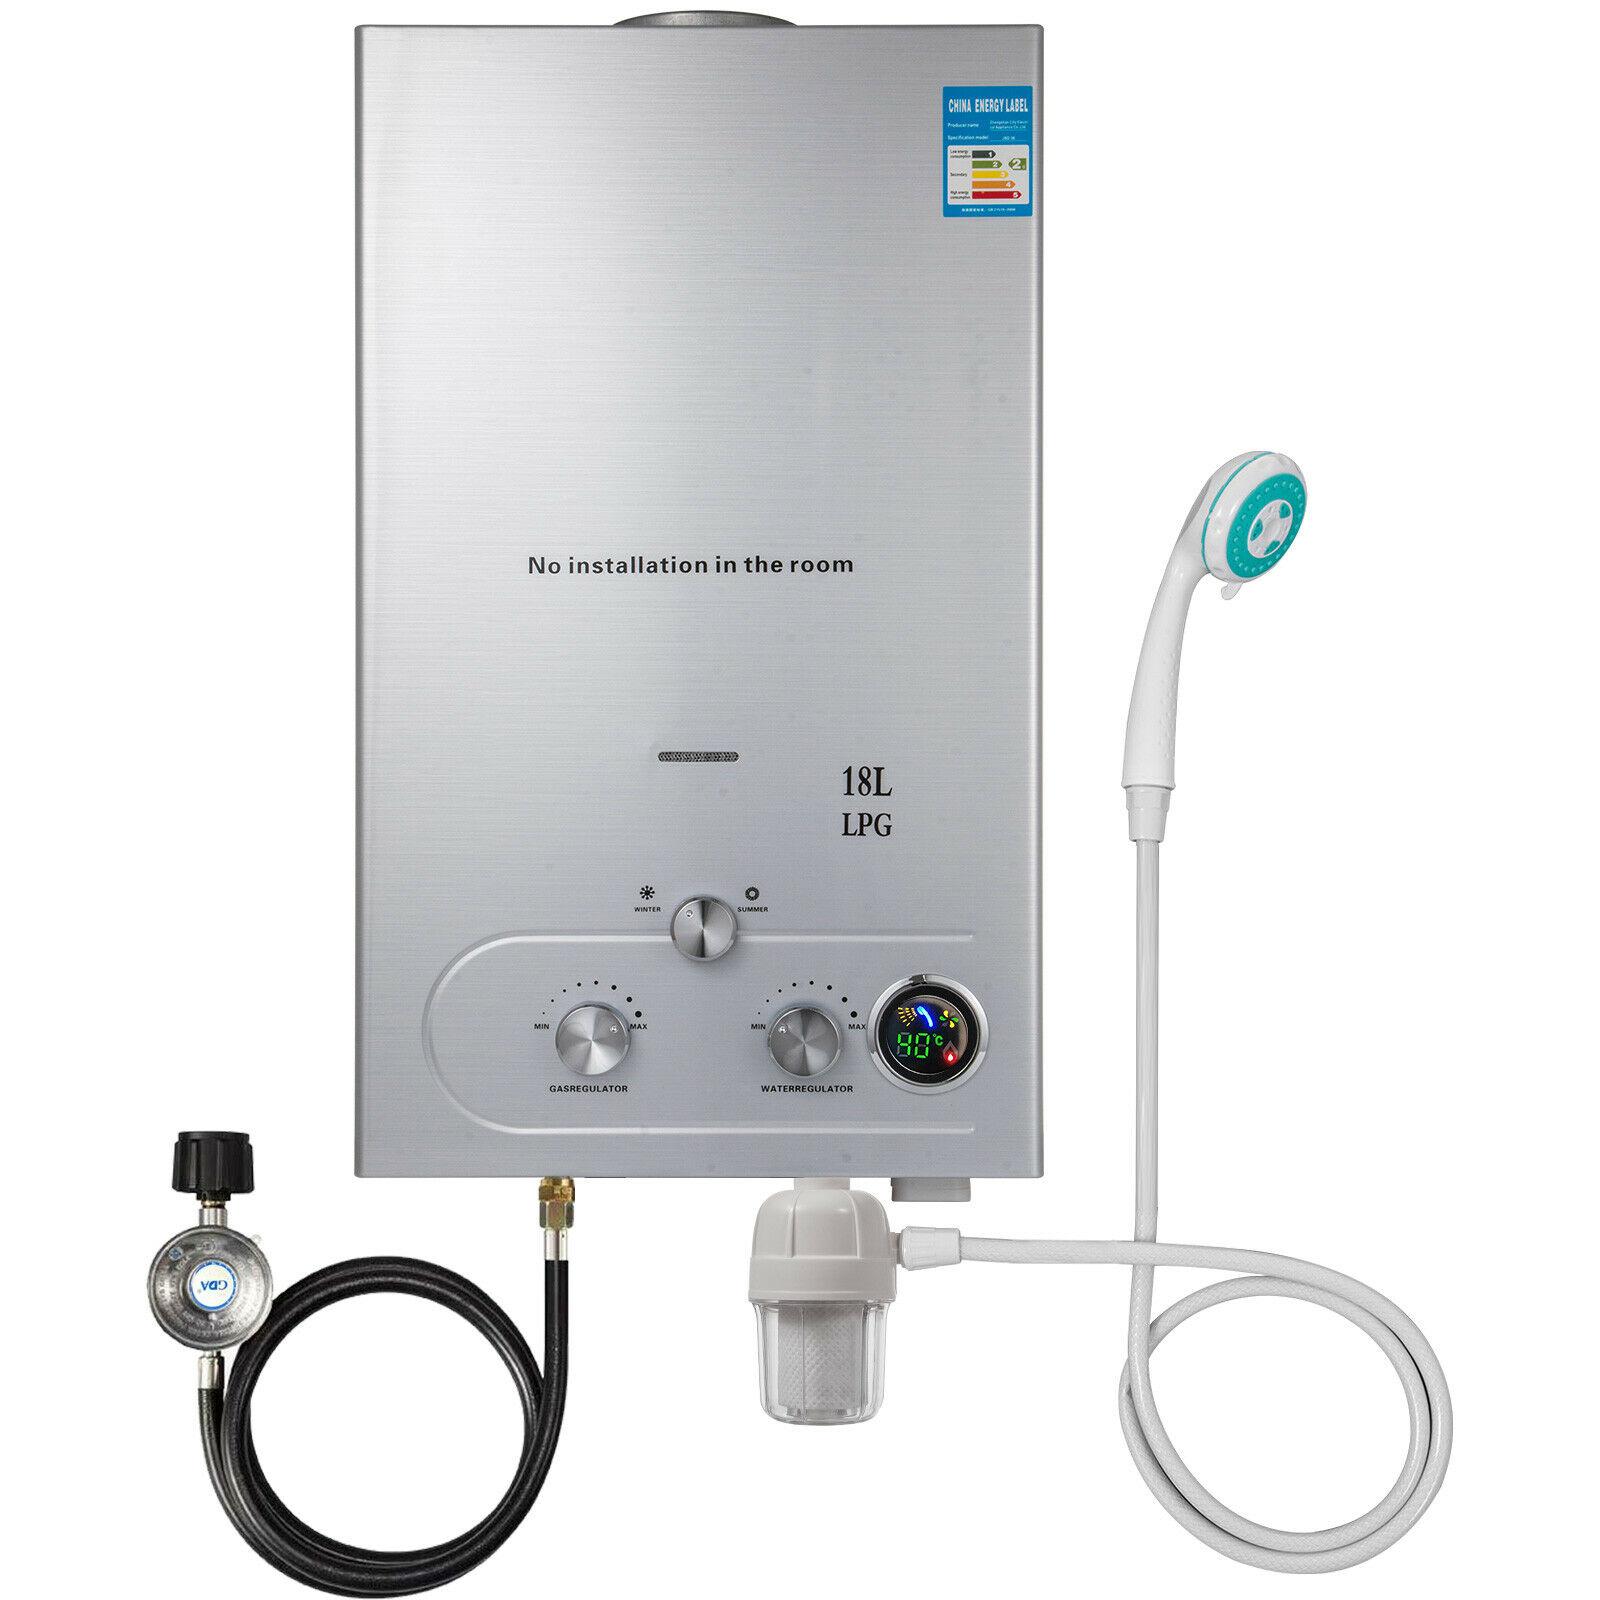 VEVOR ترقية البروبان الغاز سخان الماء الساخن Tankless 12/16/18L مع دش رئيس تصفية المياه الغاز منظم على الطلب المياه المرجل